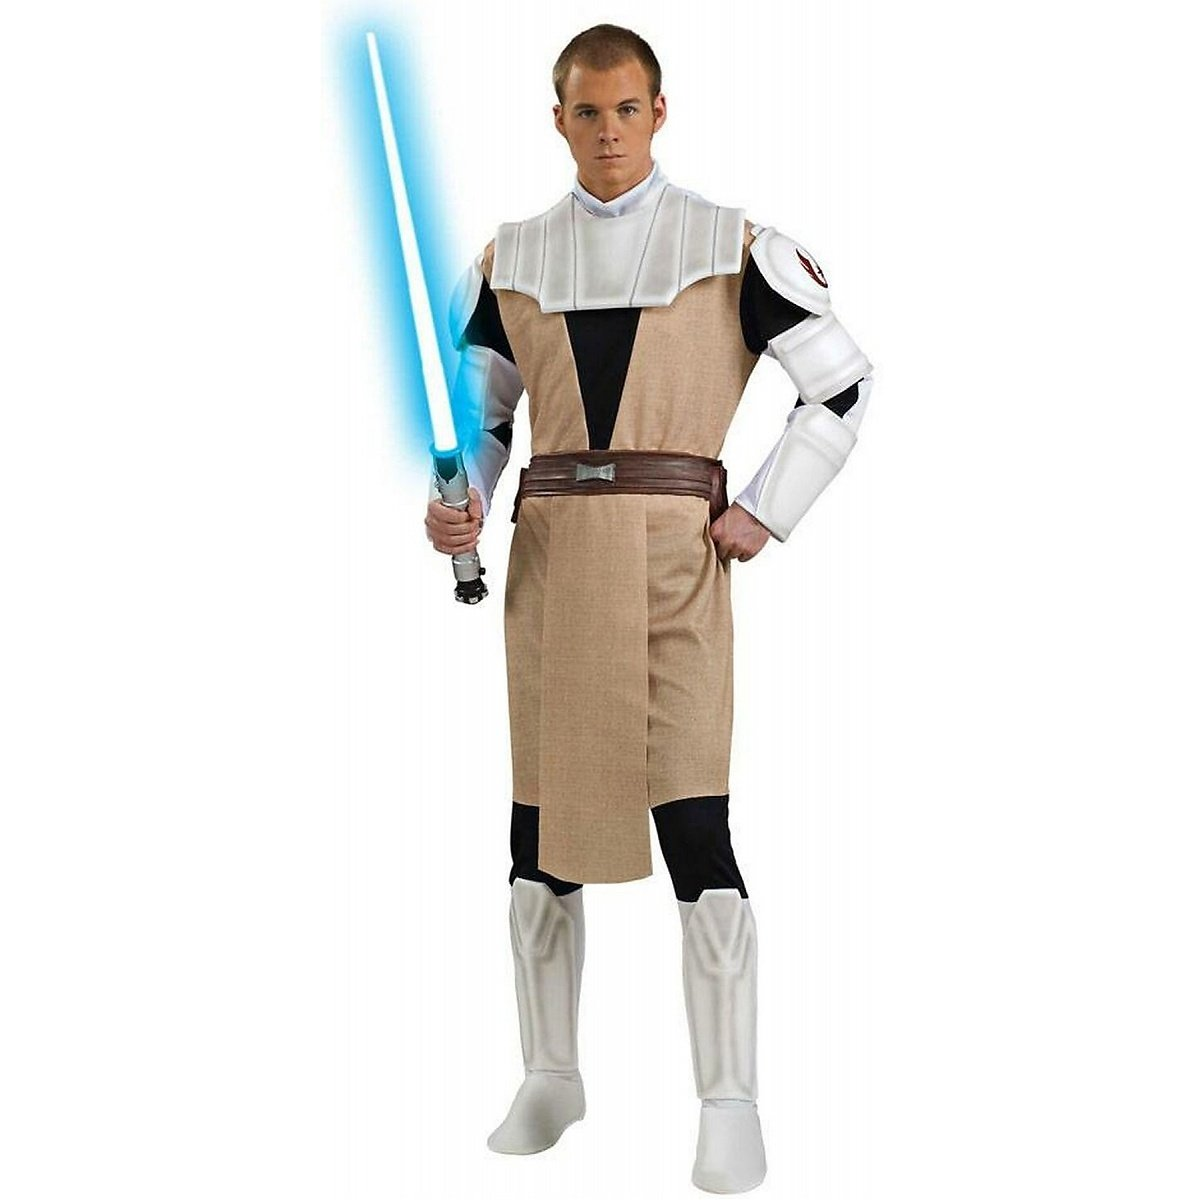 Obi-Wan Kenobi Deluxe Herrenkostüm aus Star Wars, Größe:L